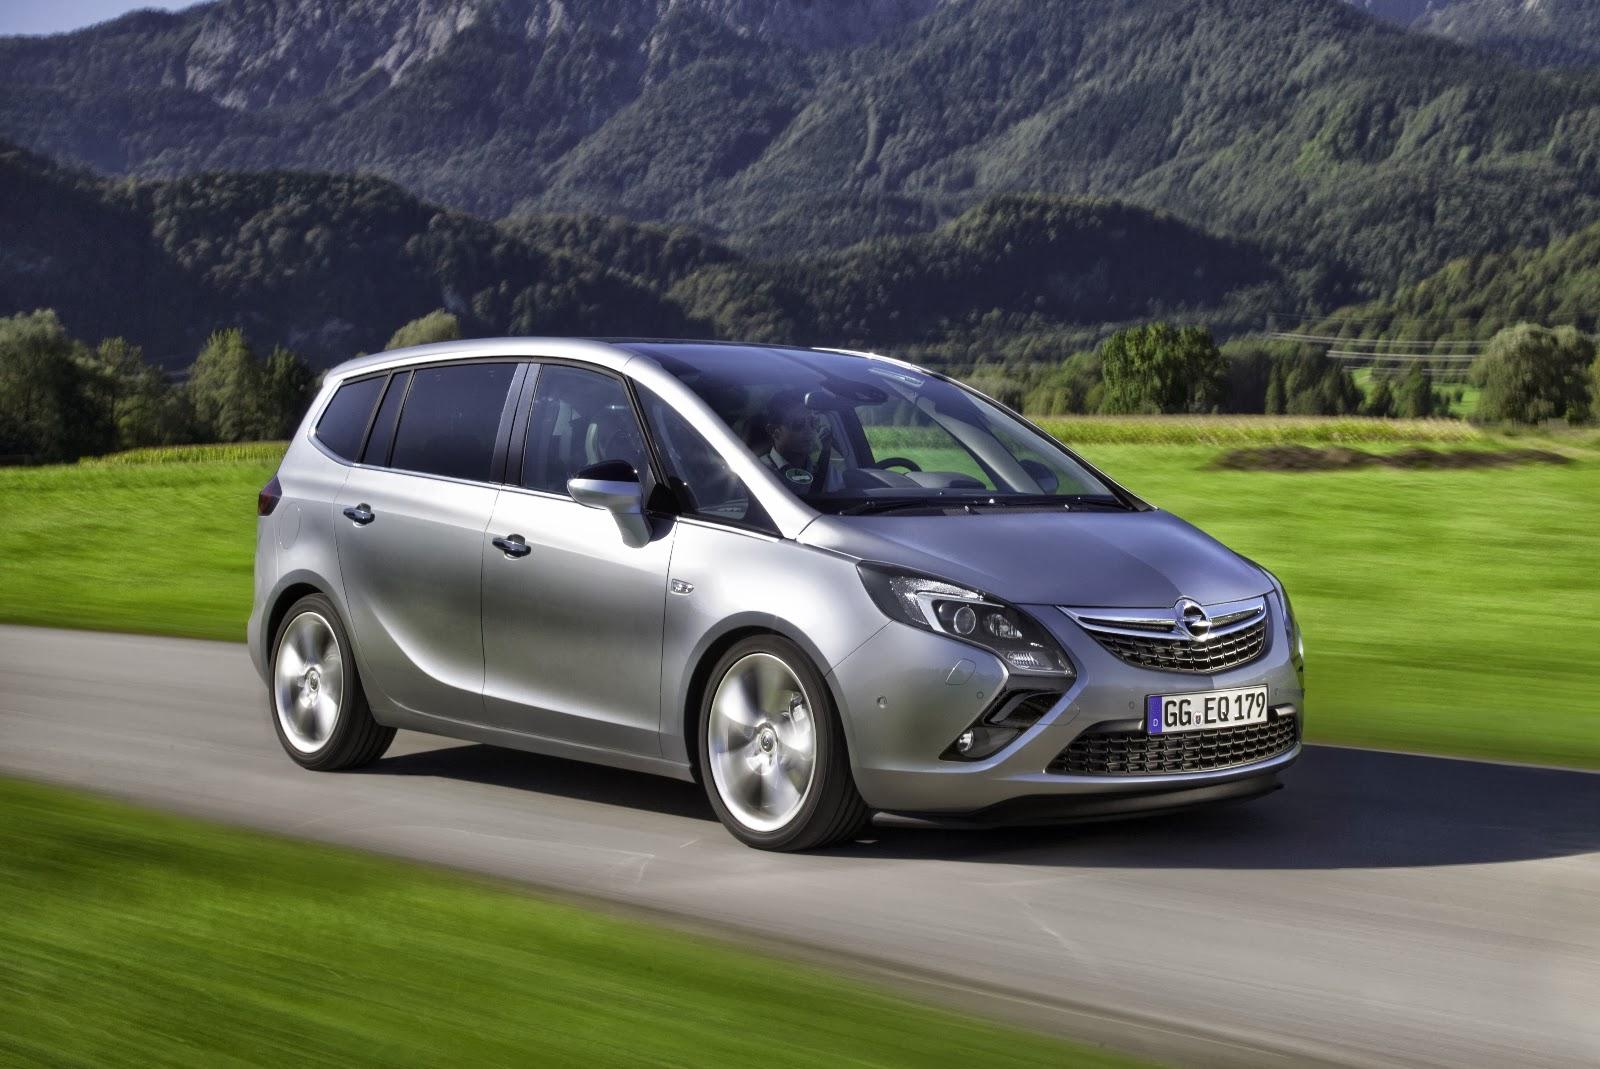 Yeni Opel Zafira Tourer 1.6 SIDI Turbo'nun gücü 147kW ...